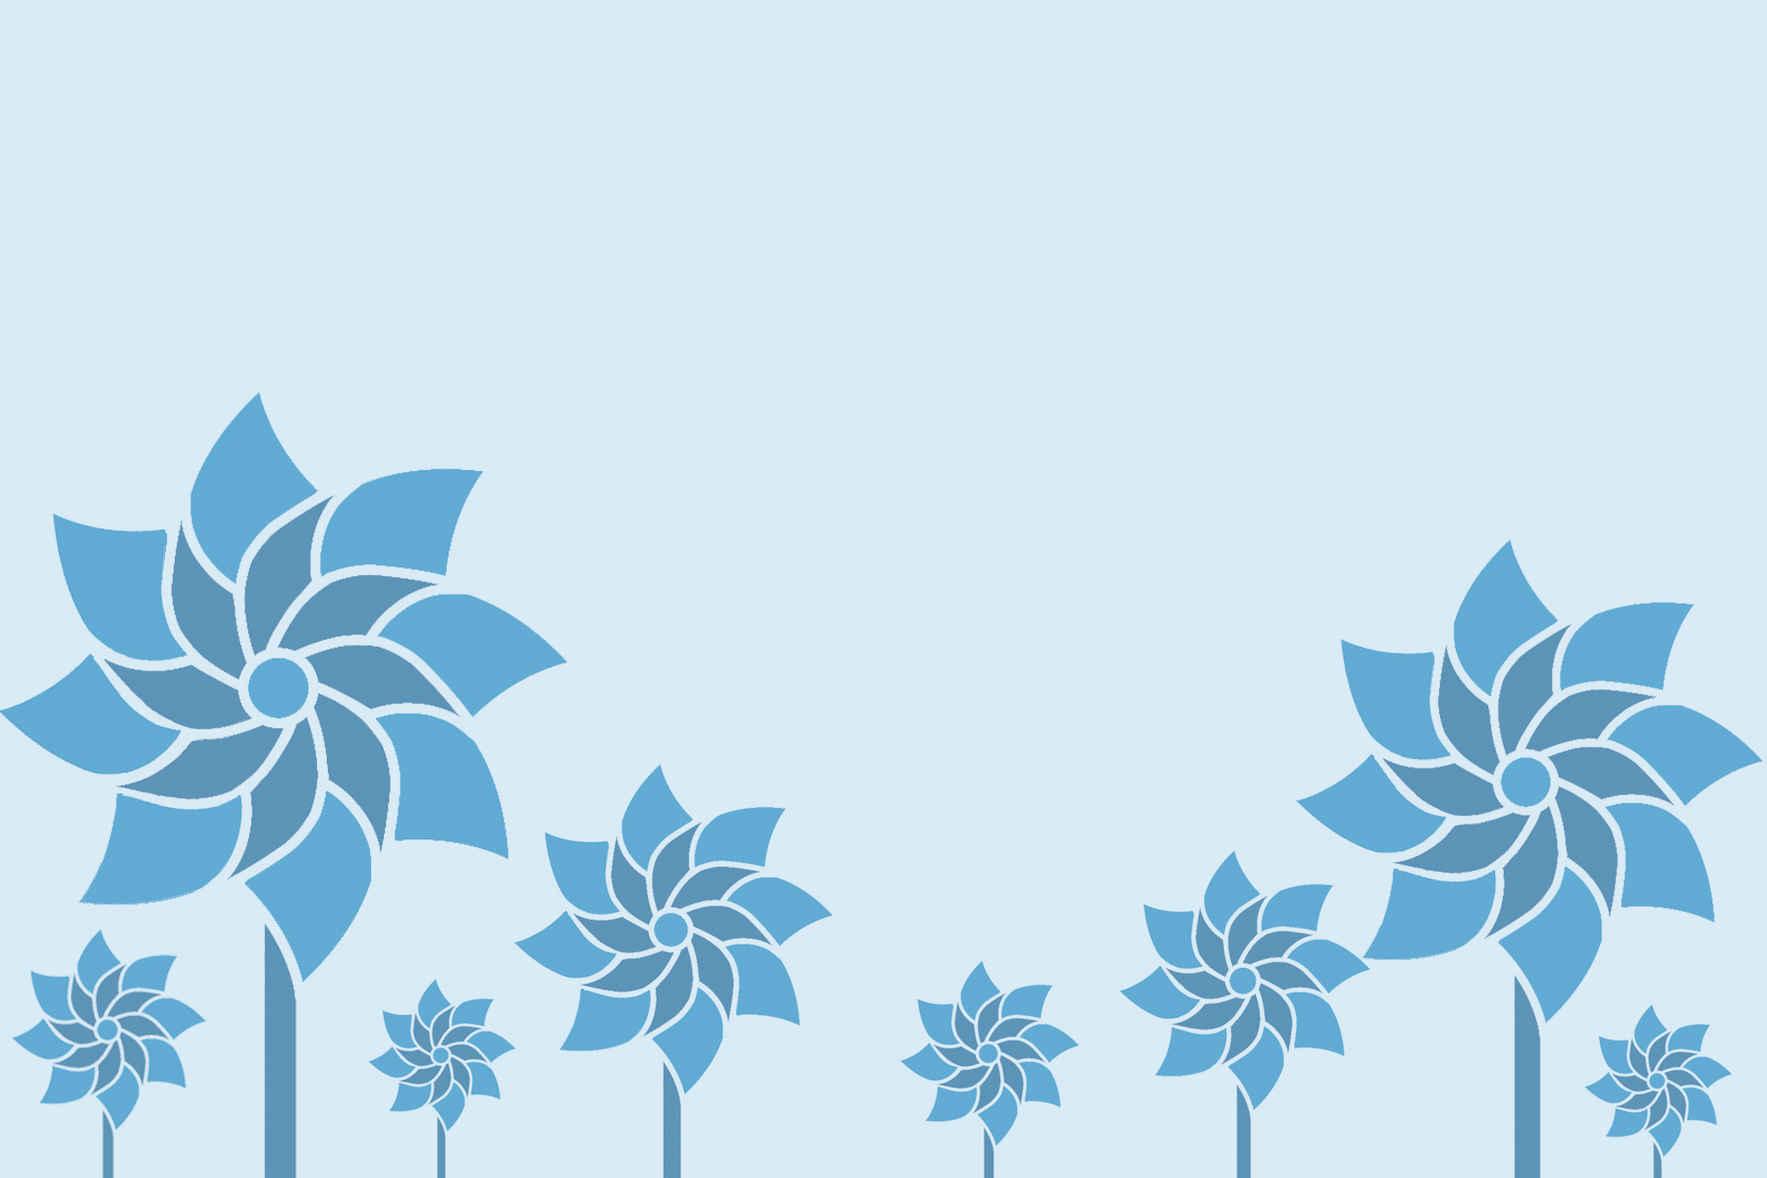 Plant your pinwheel image